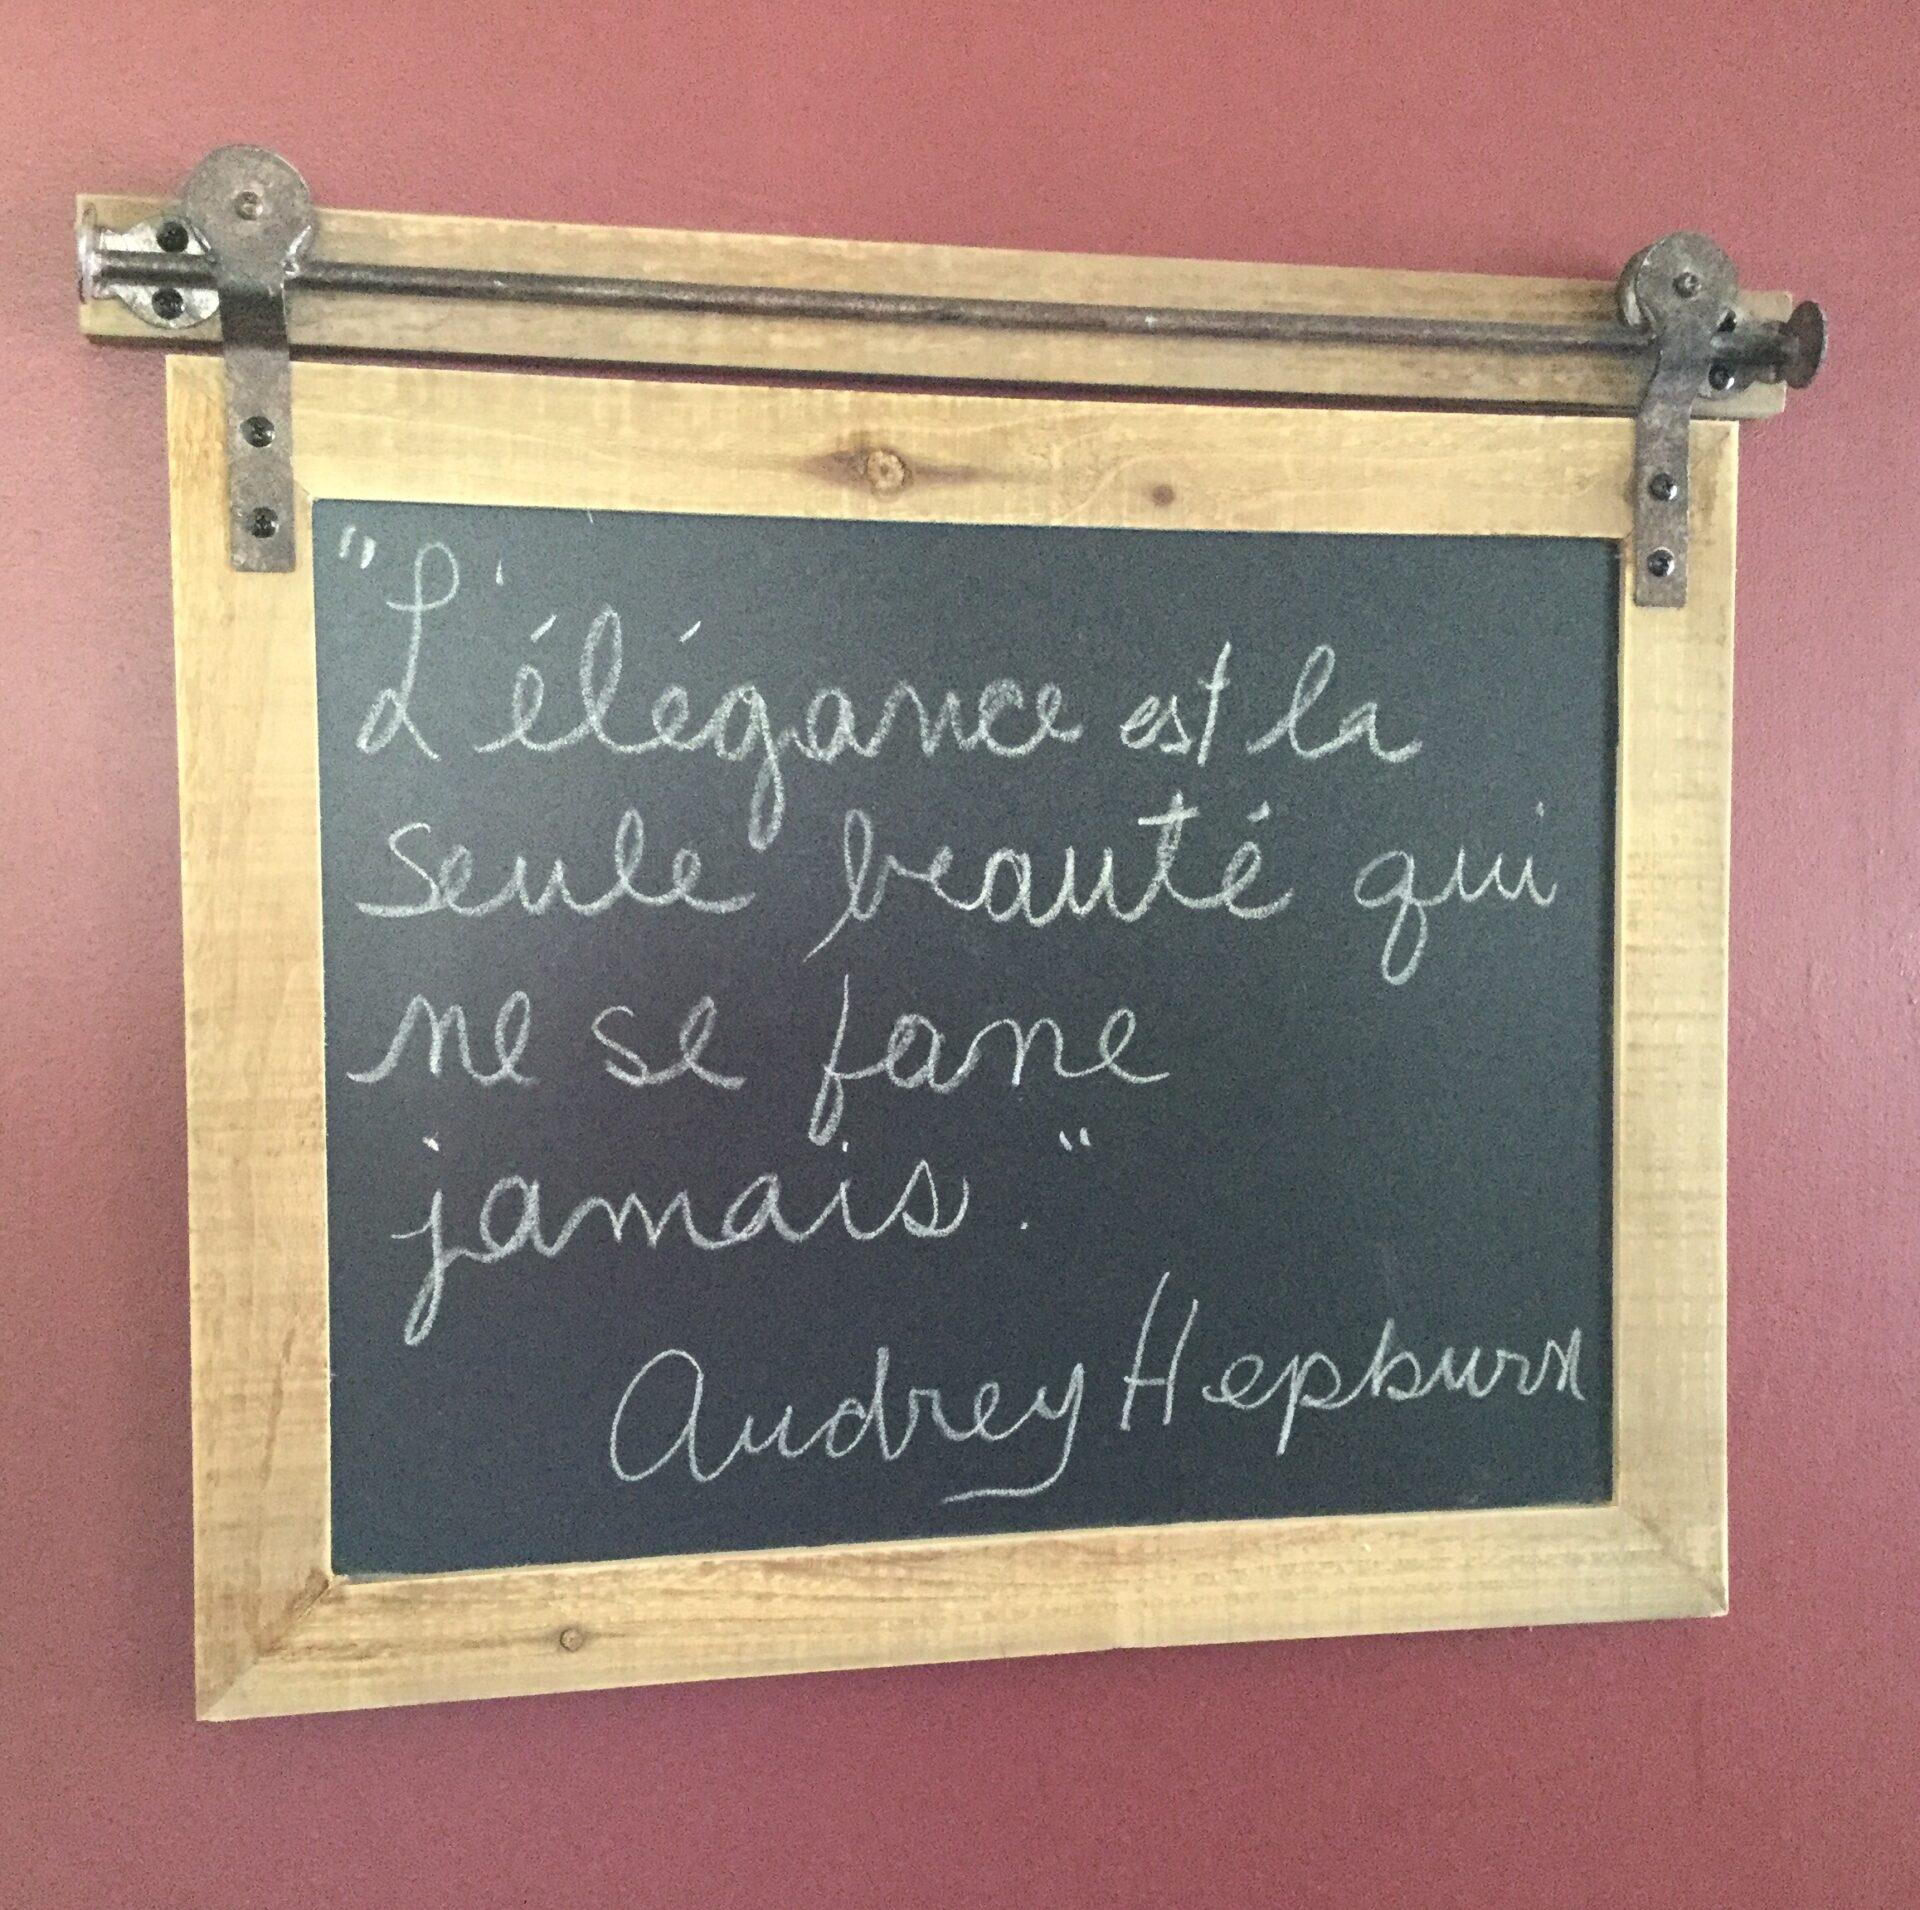 citation Audry Hepburn